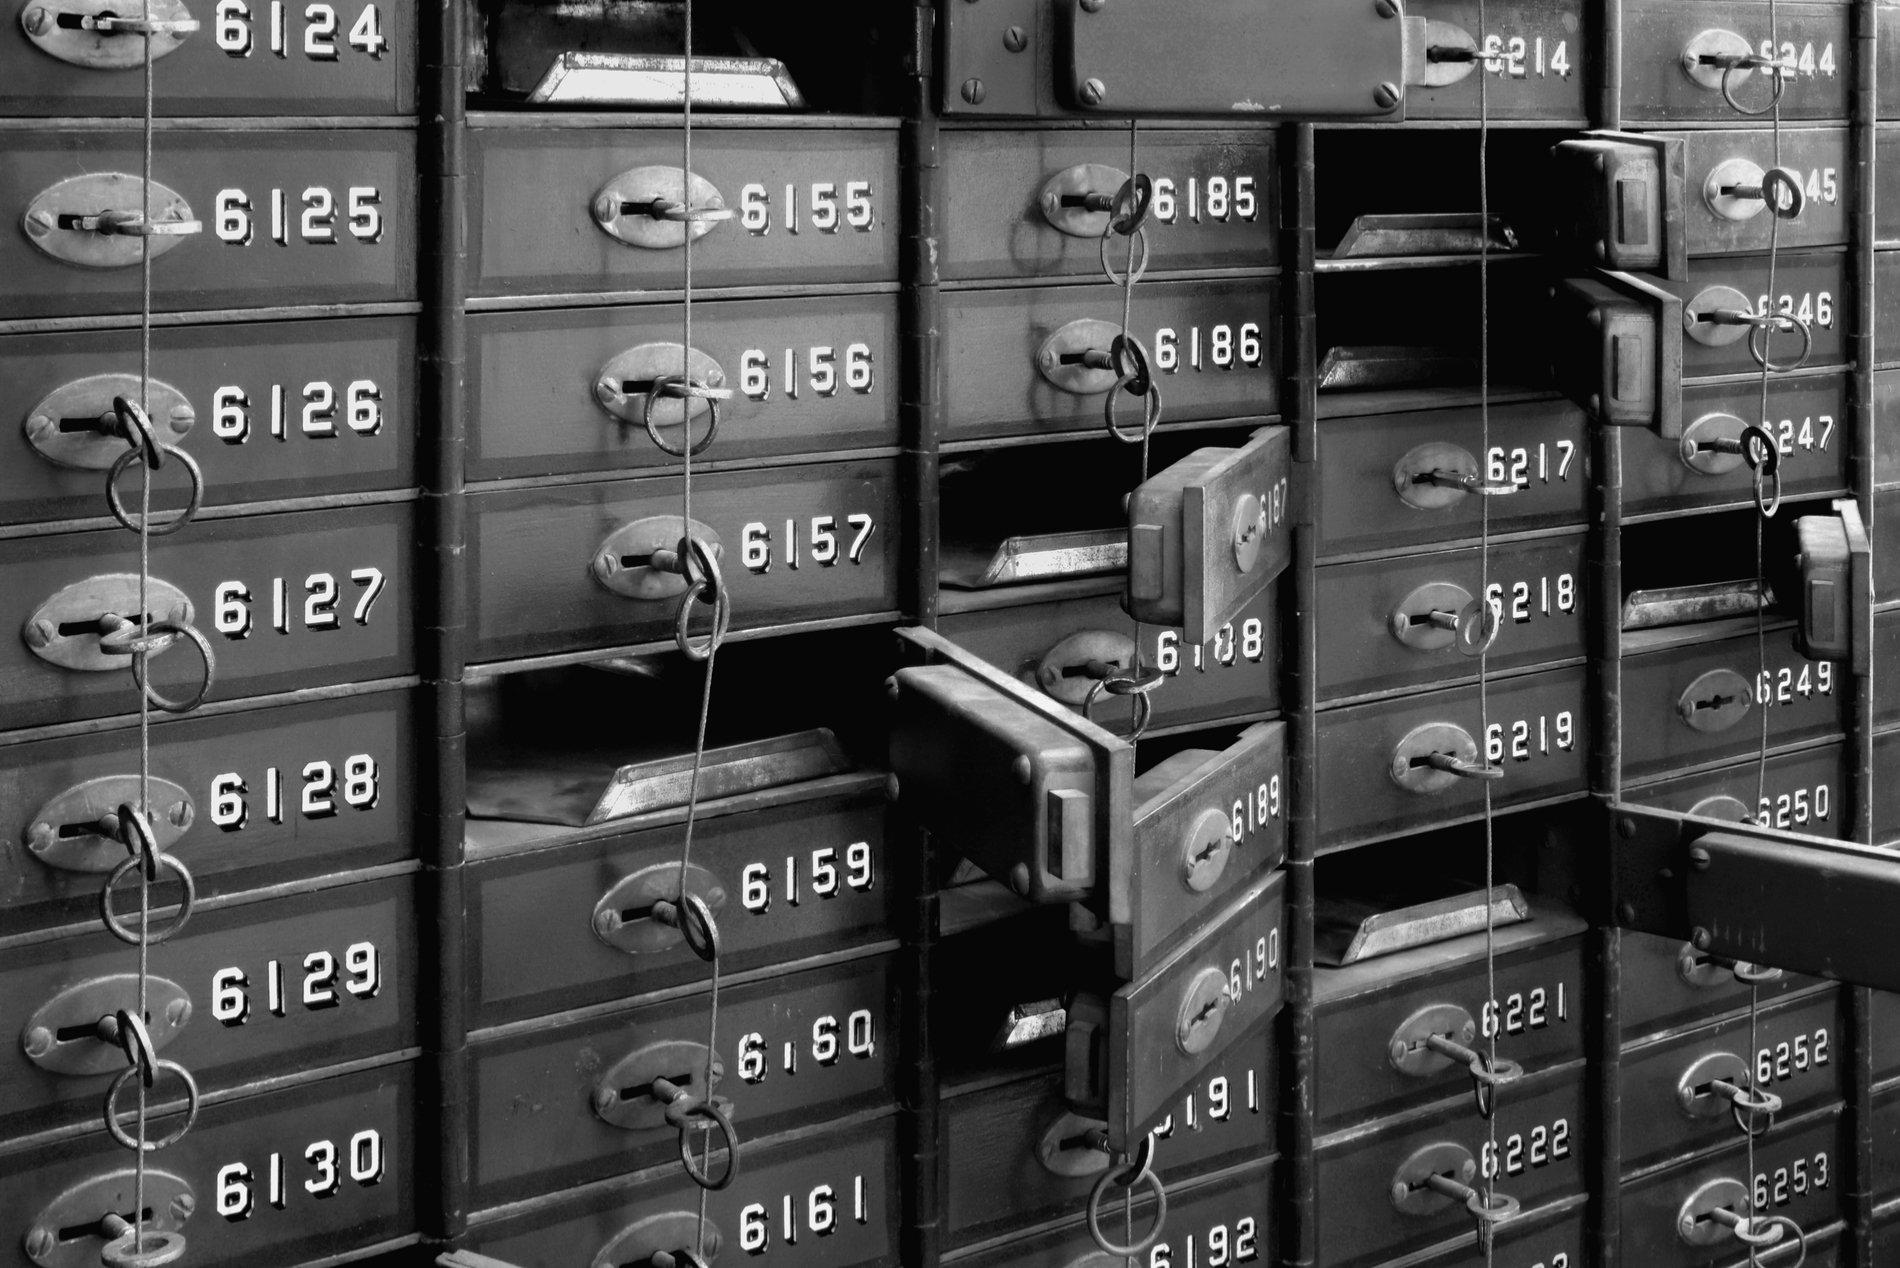 NEM Foundation: Stolen Coincheck Funds Not Sent to Exchanges - CoinDesk